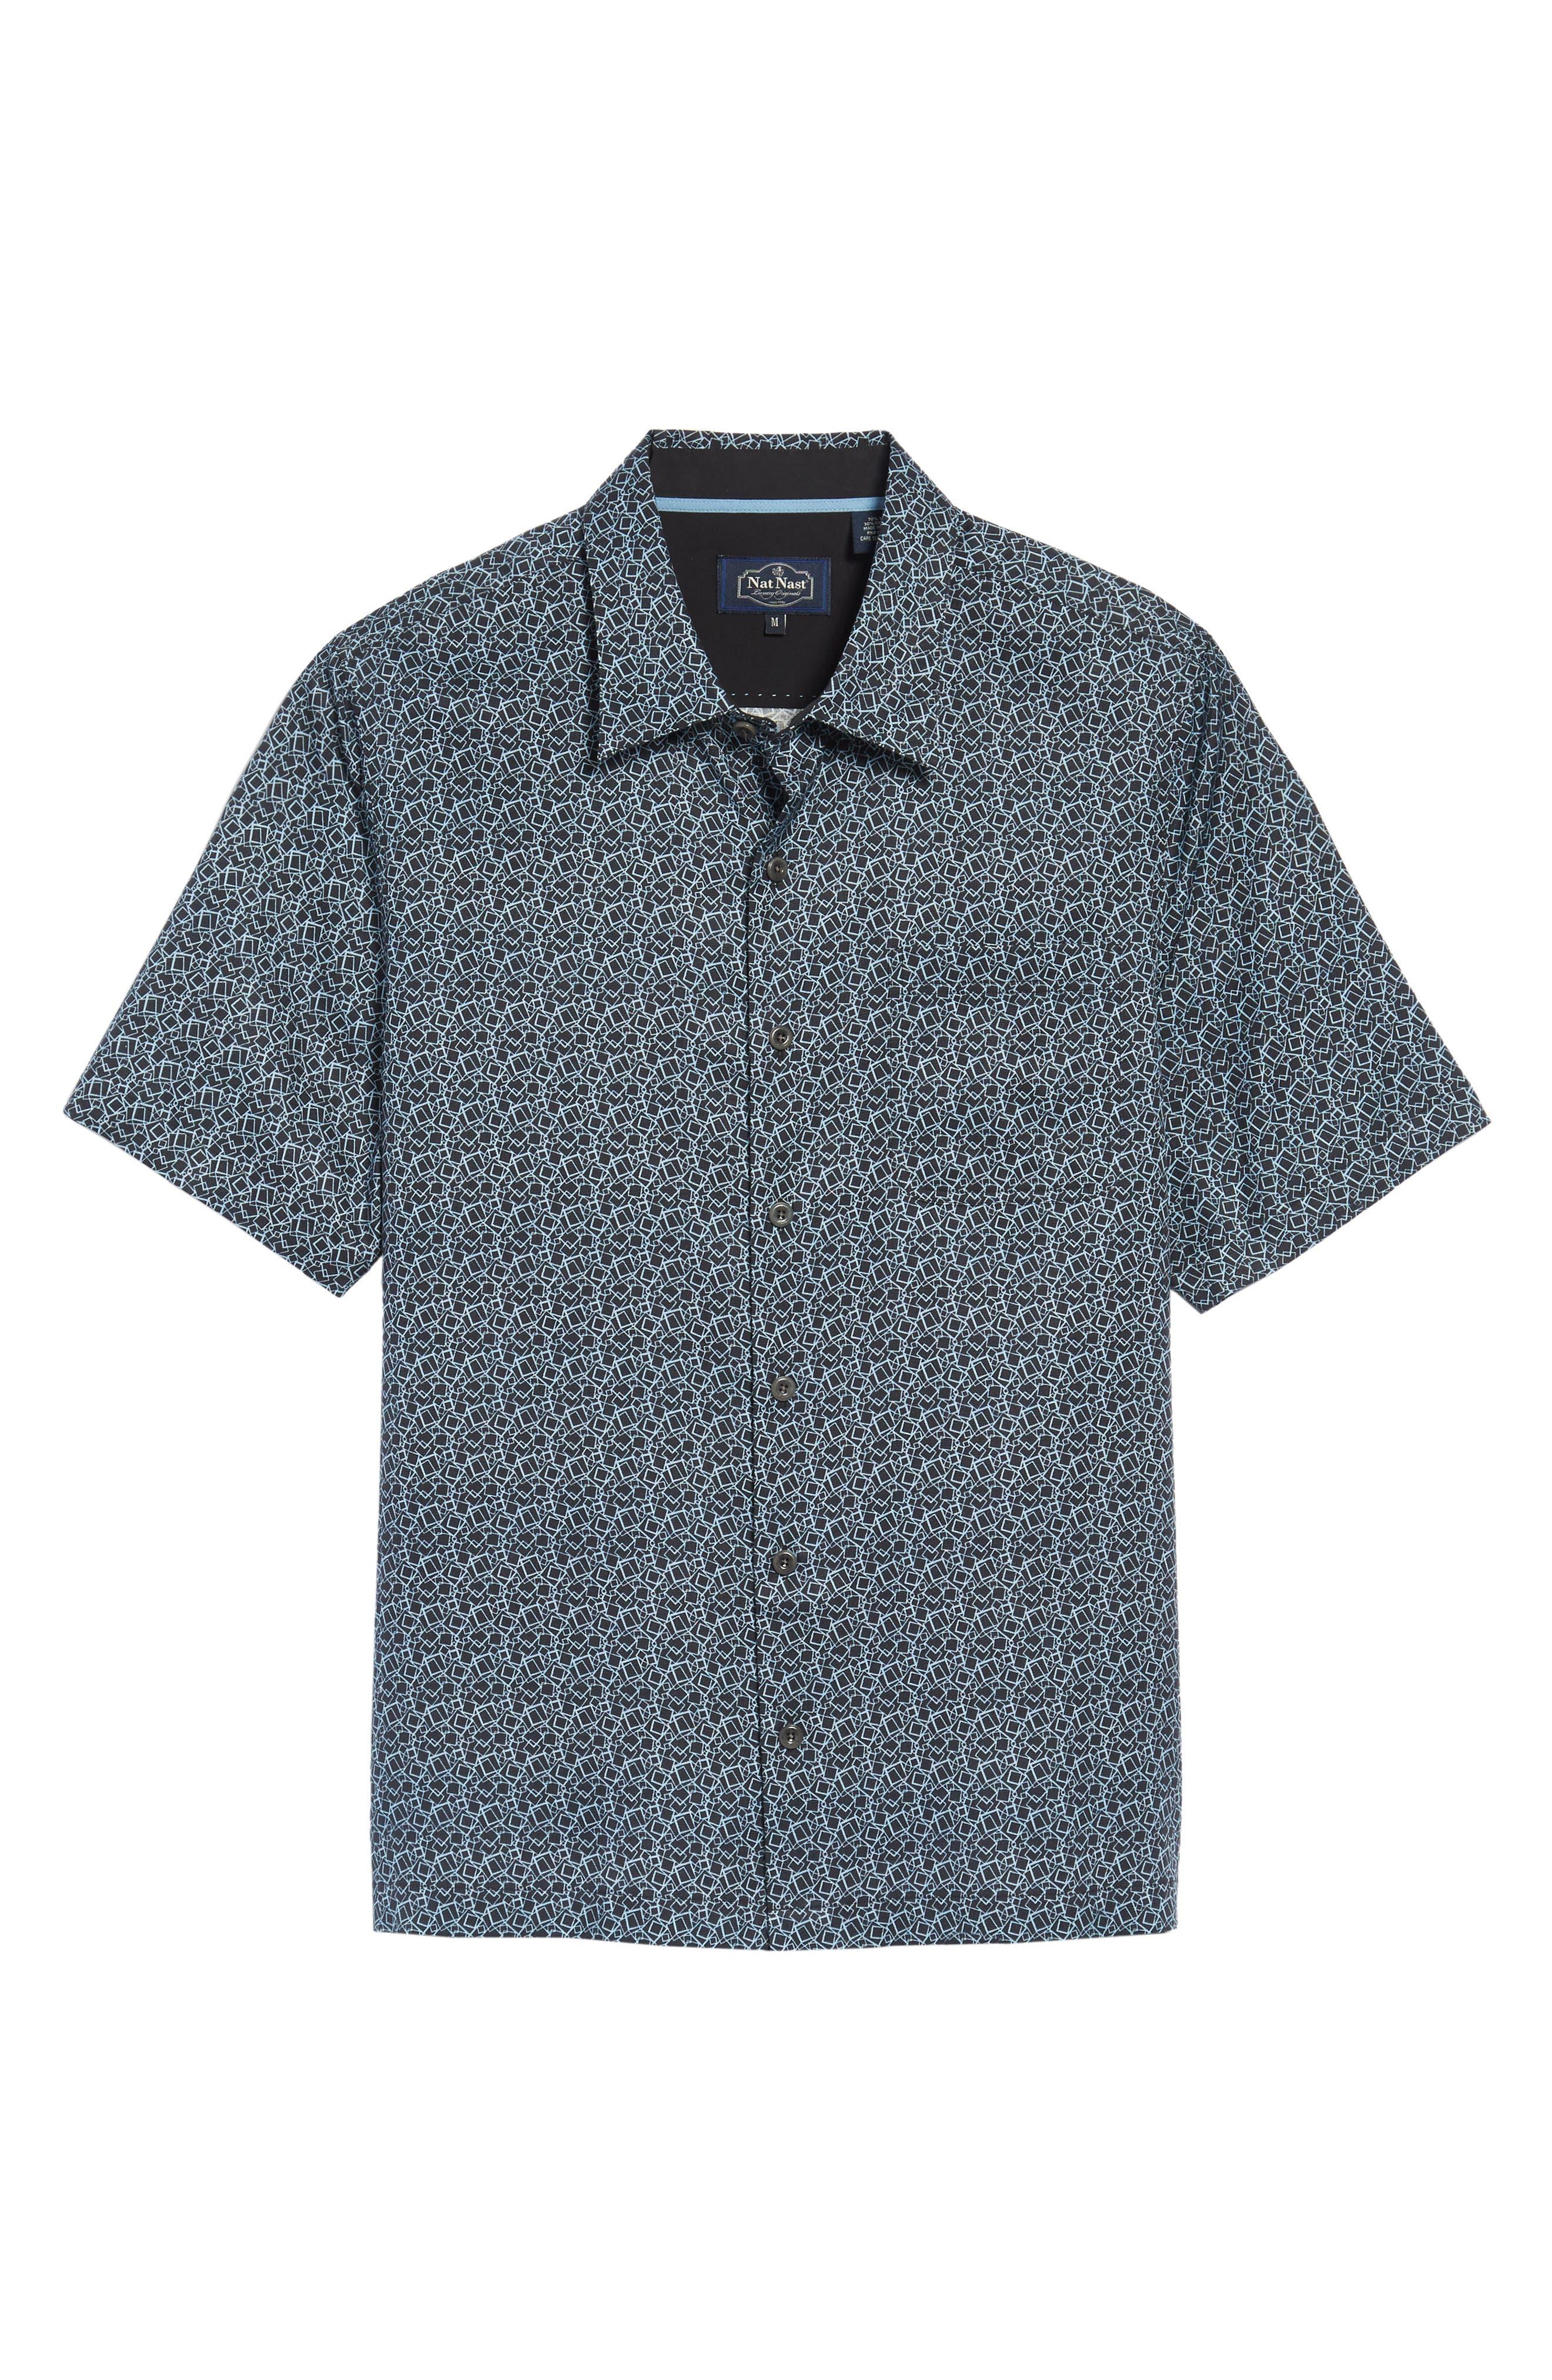 Blizzard Classic Fit Silk Blend Sport Shirt,                             Alternate thumbnail 6, color,                             001